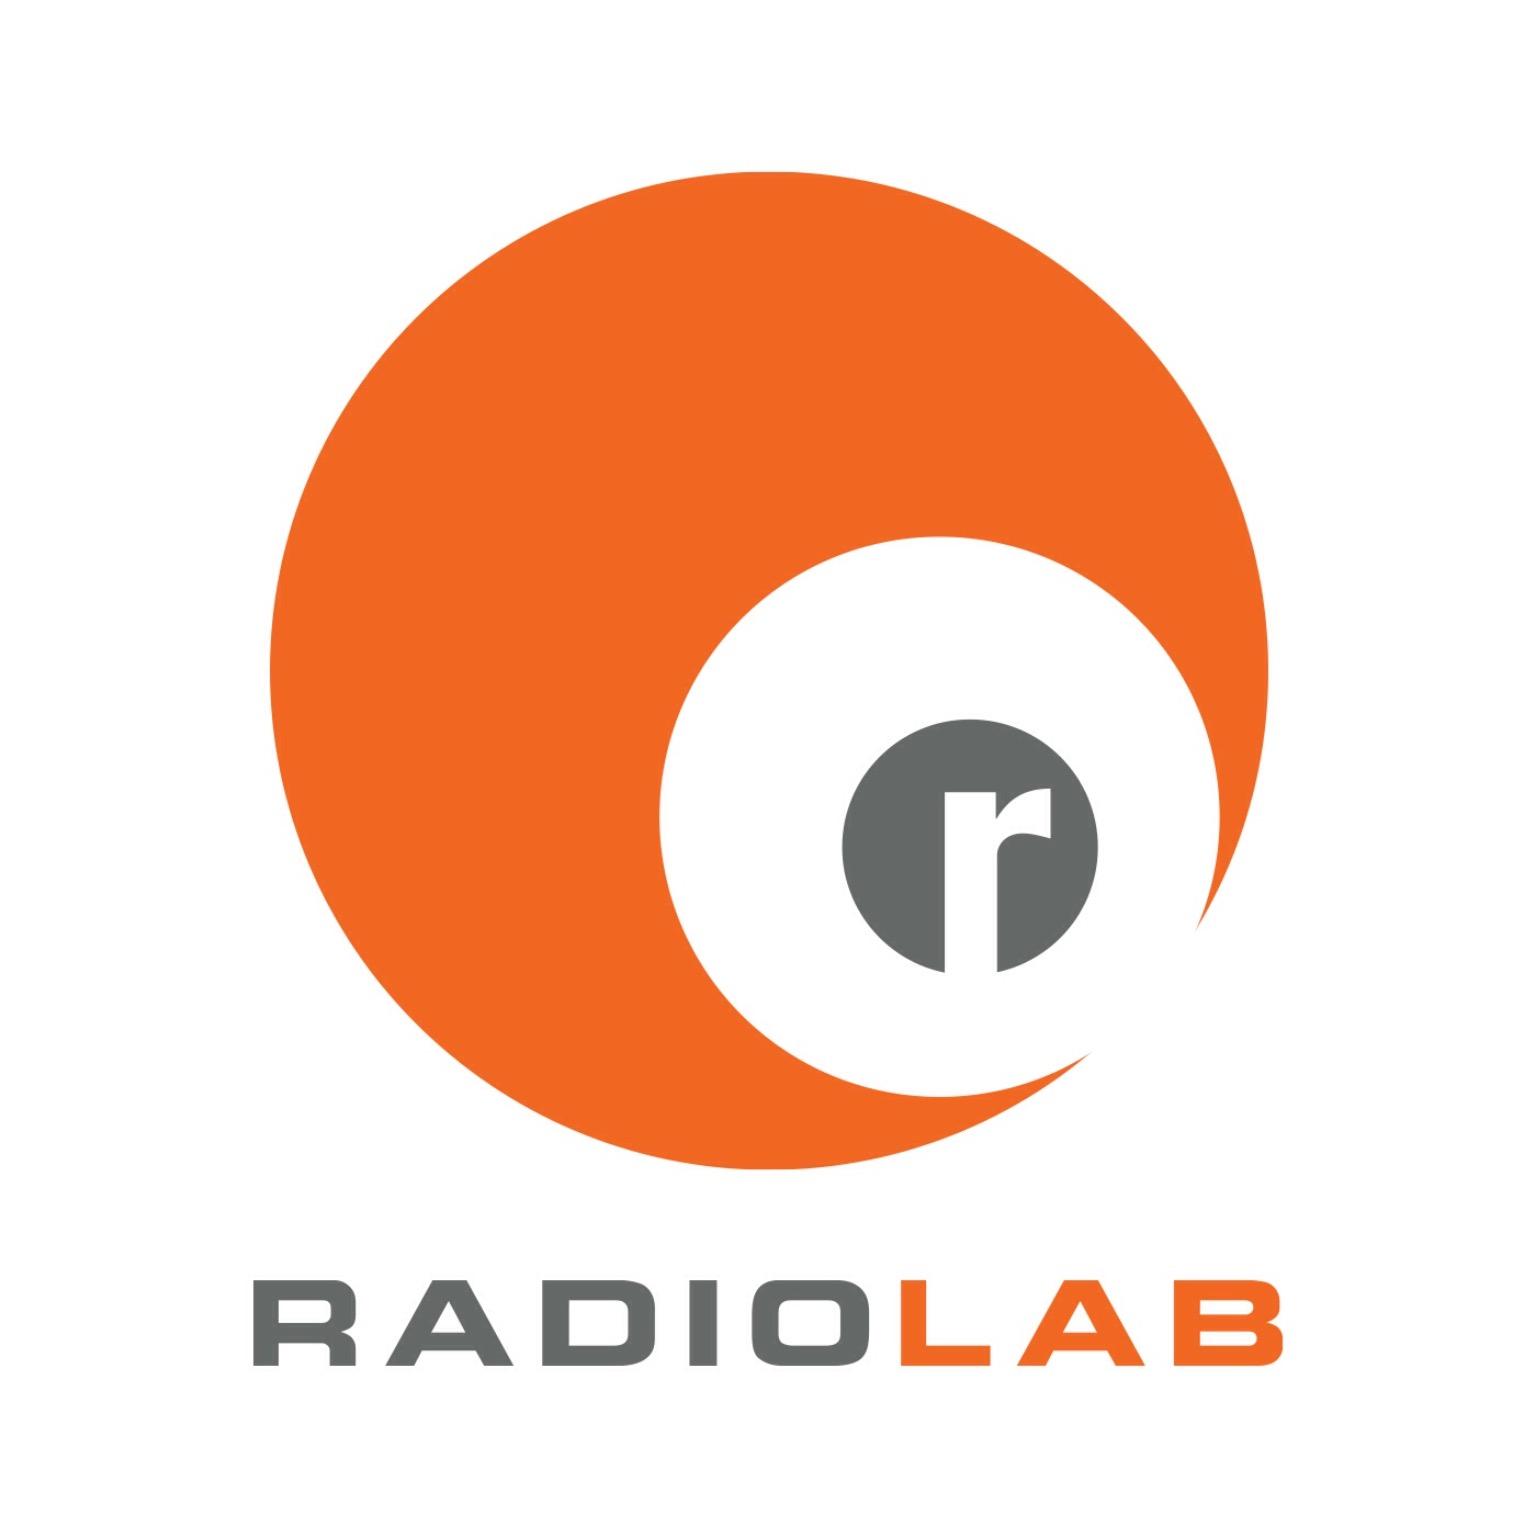 Radiolab from WNYC Podcast   ashleyjoanna.com